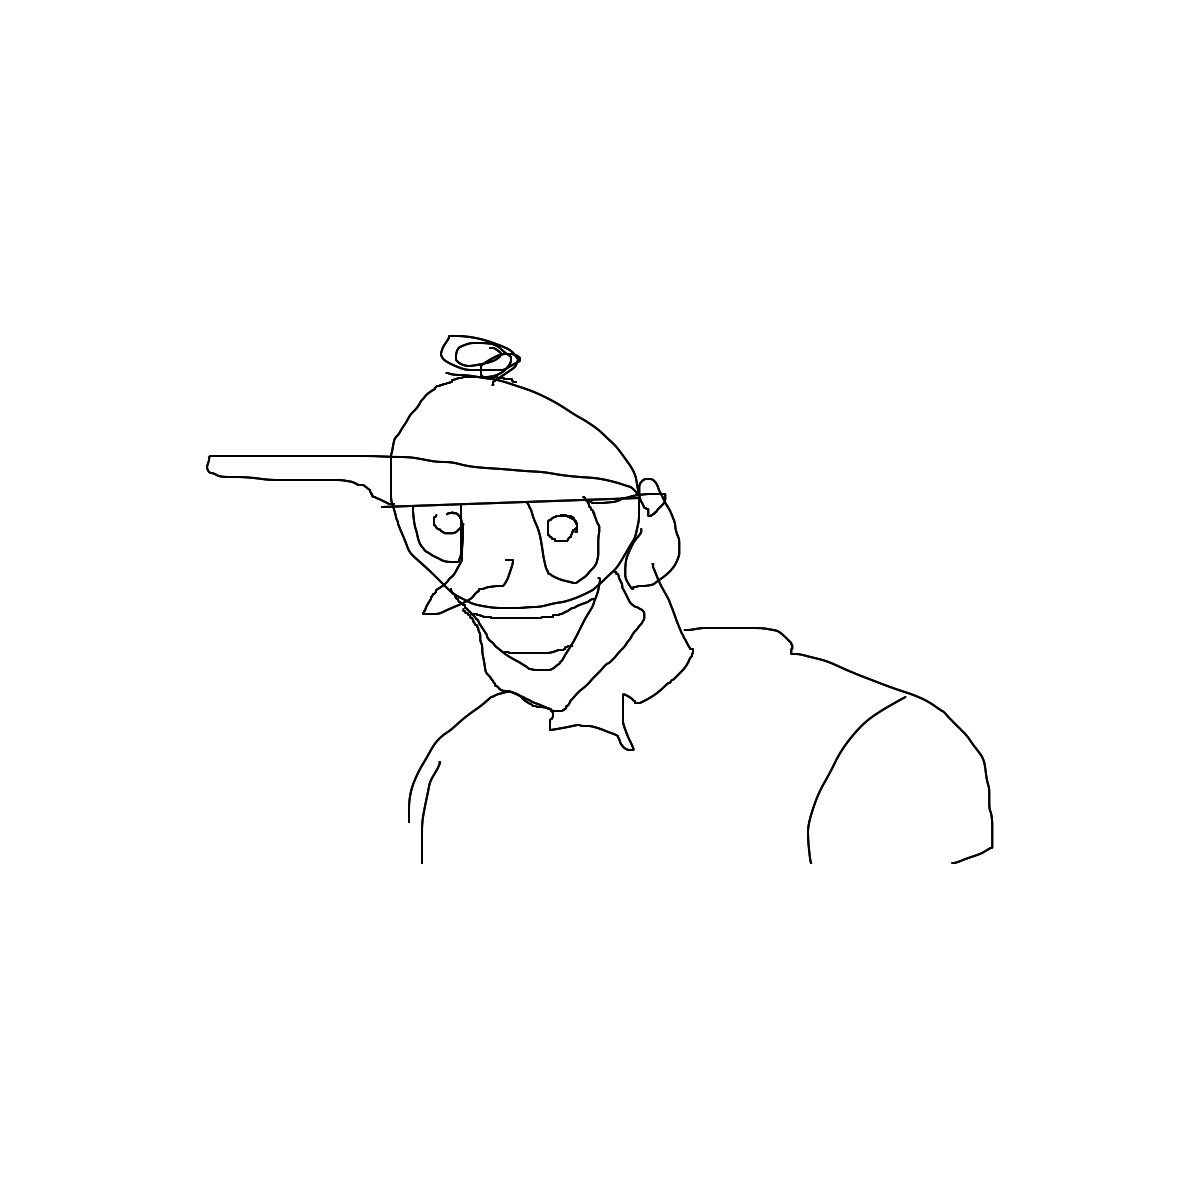 BAAAM drawing#14620 lat:52.0797386169433600lng: 13.8359050750732420